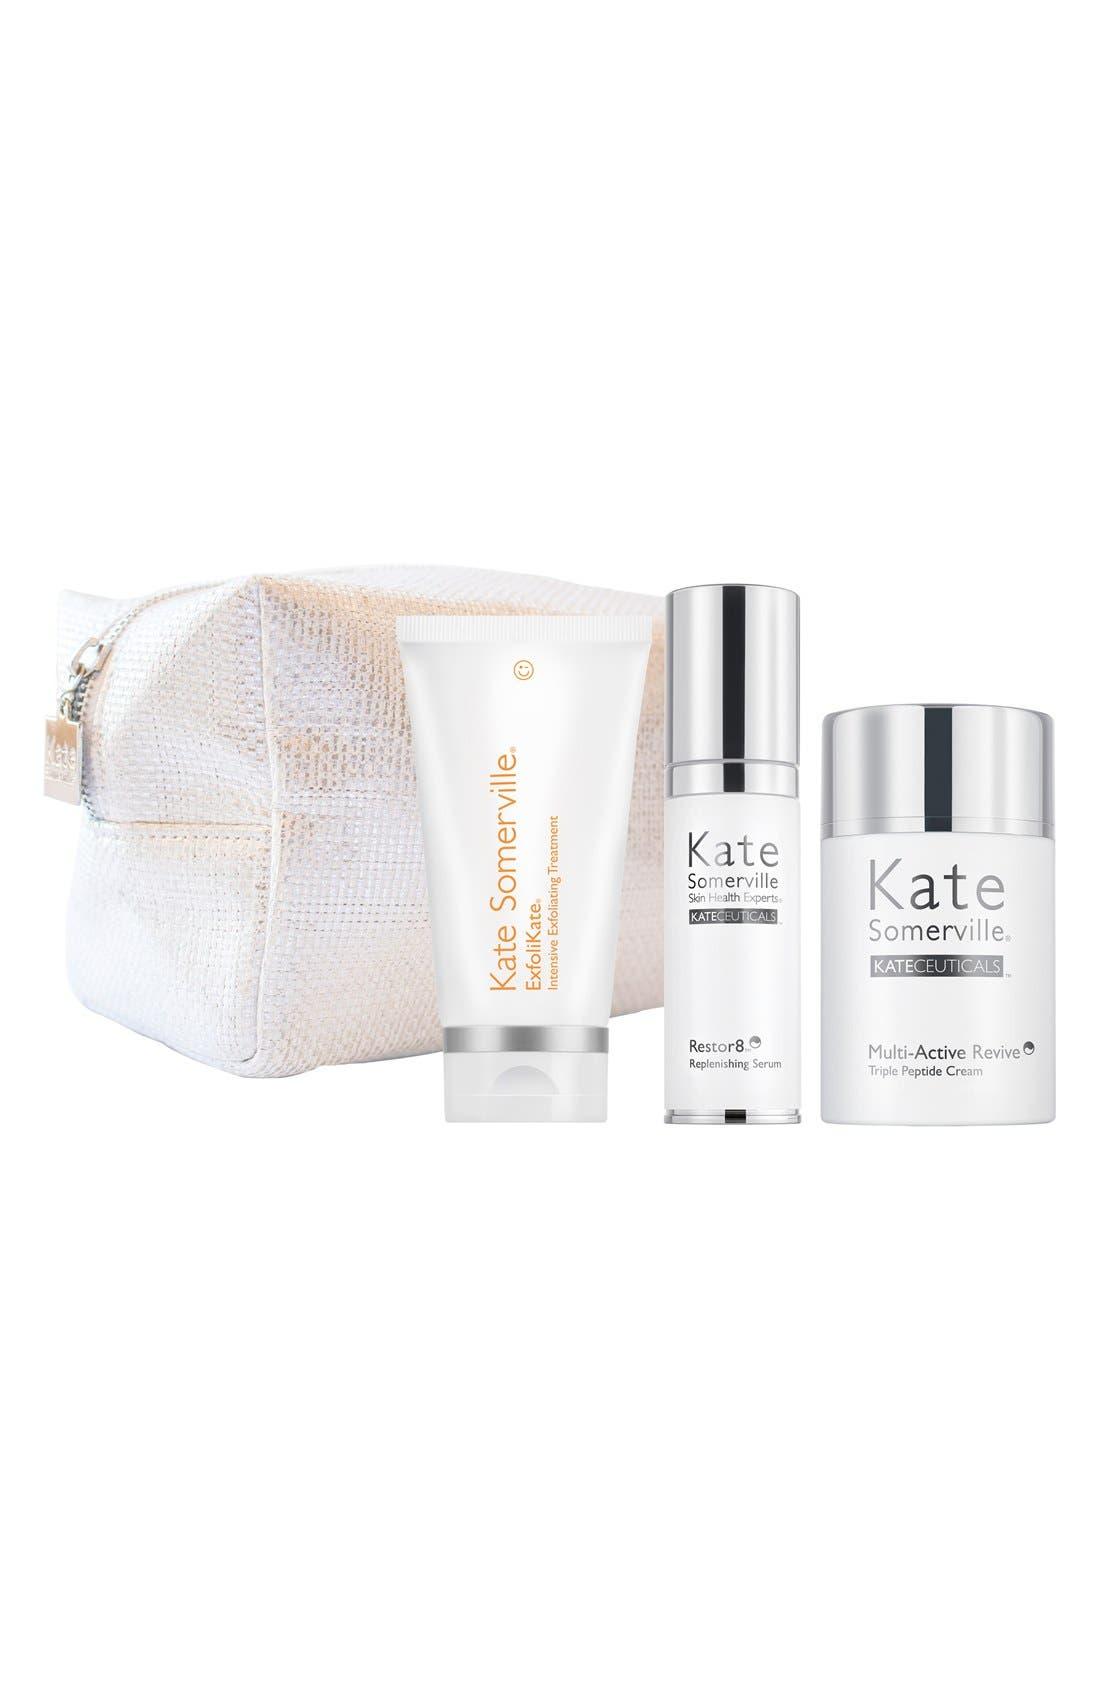 Kate Somerville® 'Youthful Radiance' Set ($430 Value)